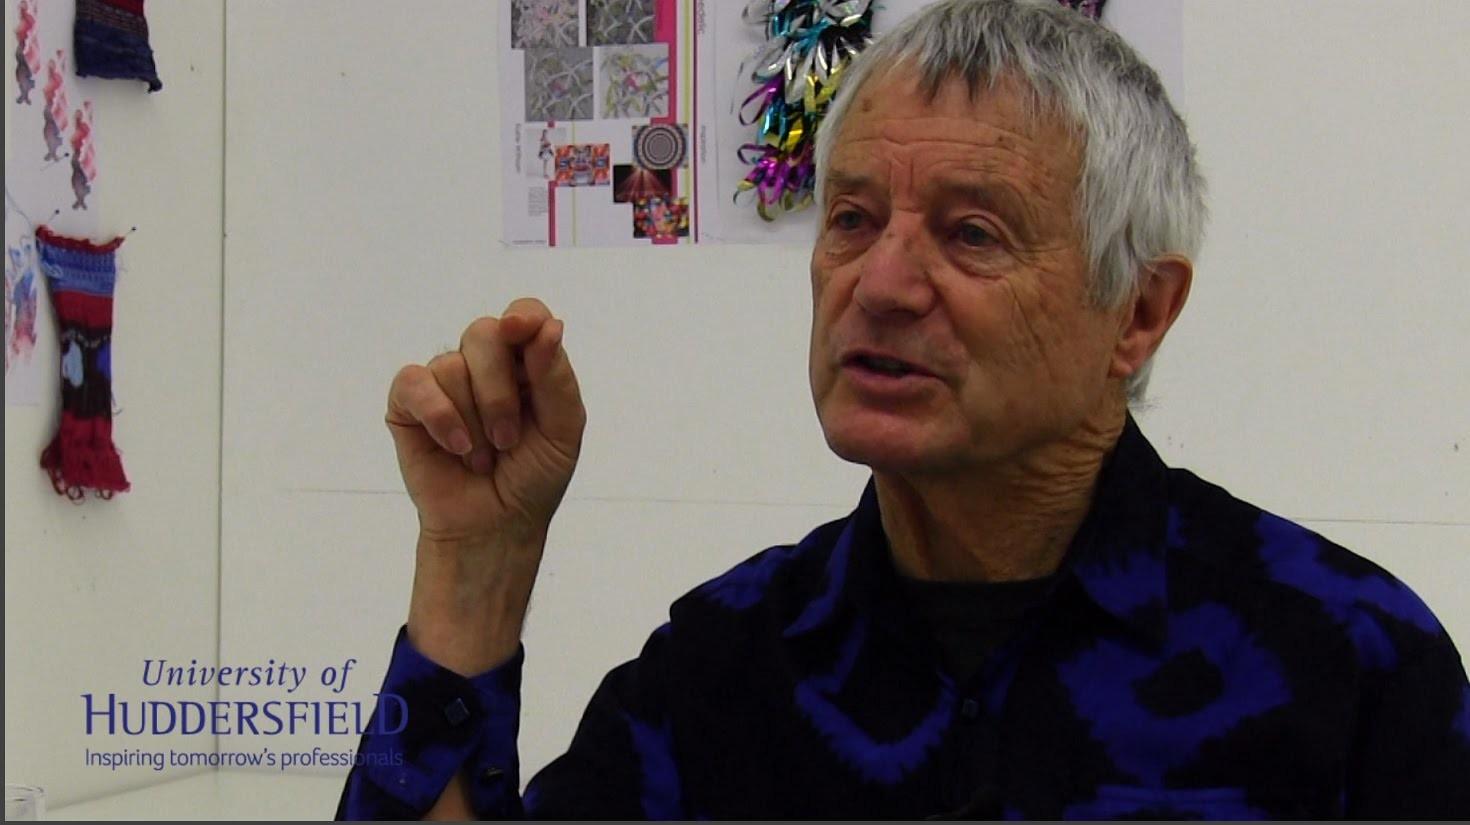 Kaffe Fassett - knitwear and textile designer - at the Univ of Huddersfield